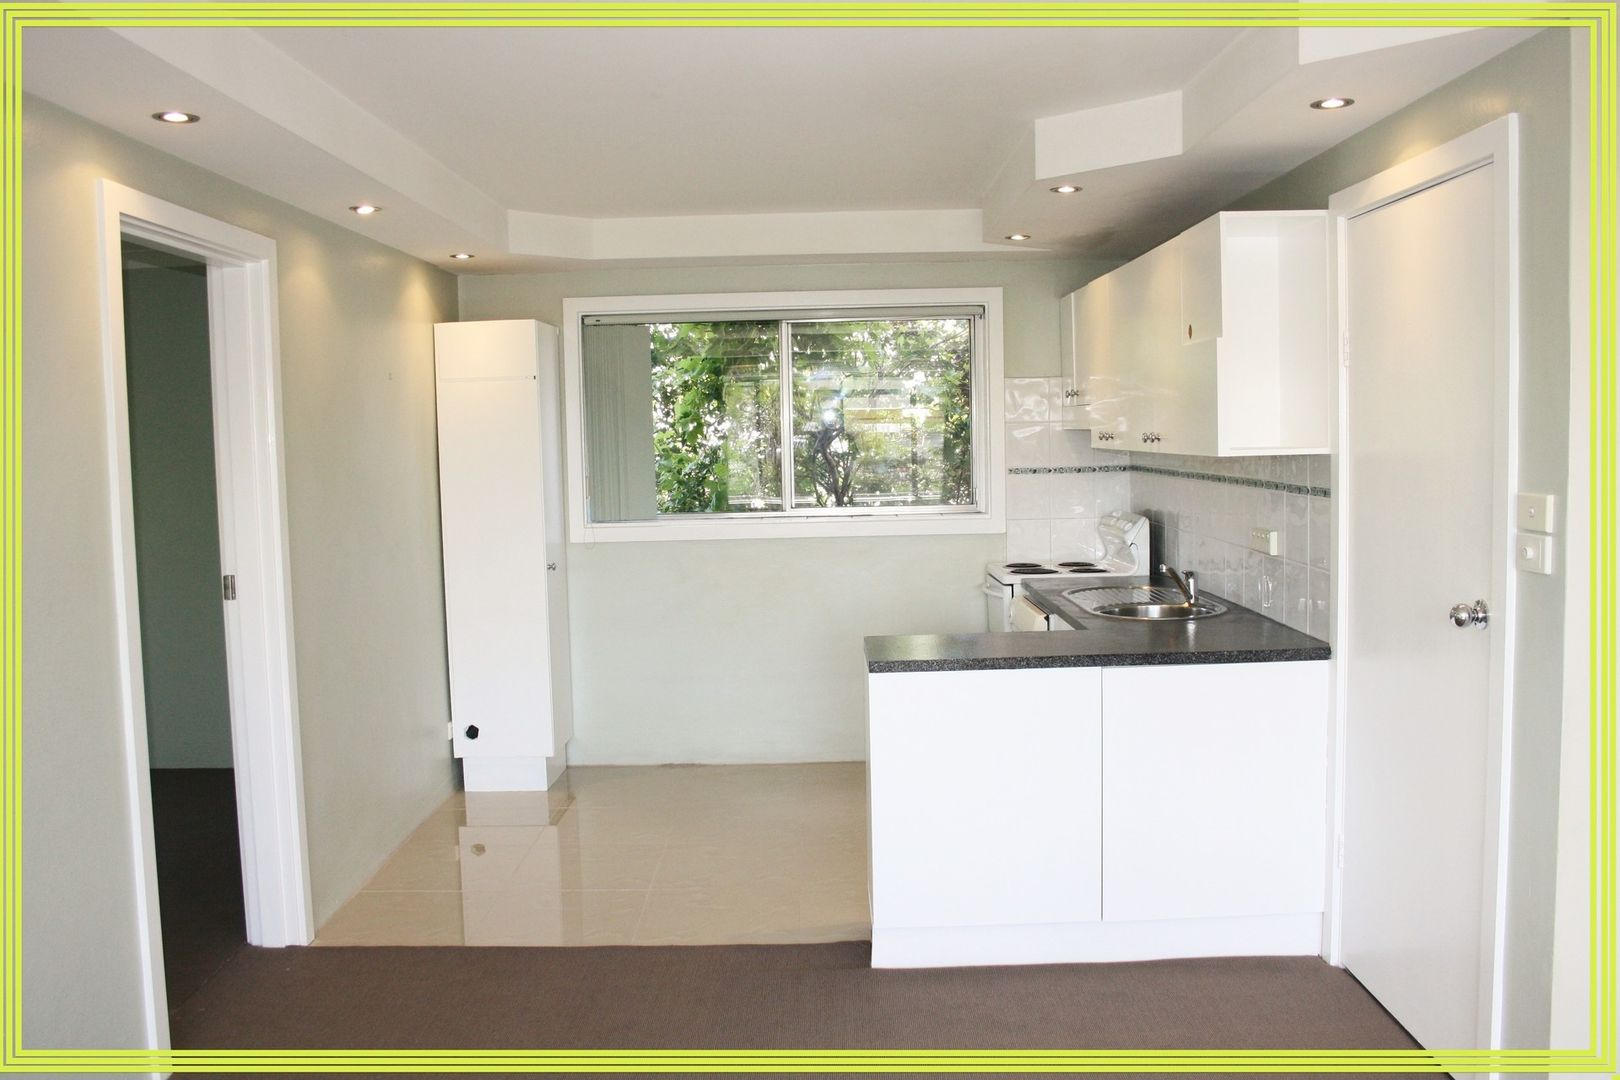 3/12 Morisset Street, Queanbeyan West NSW 2620, Image 0